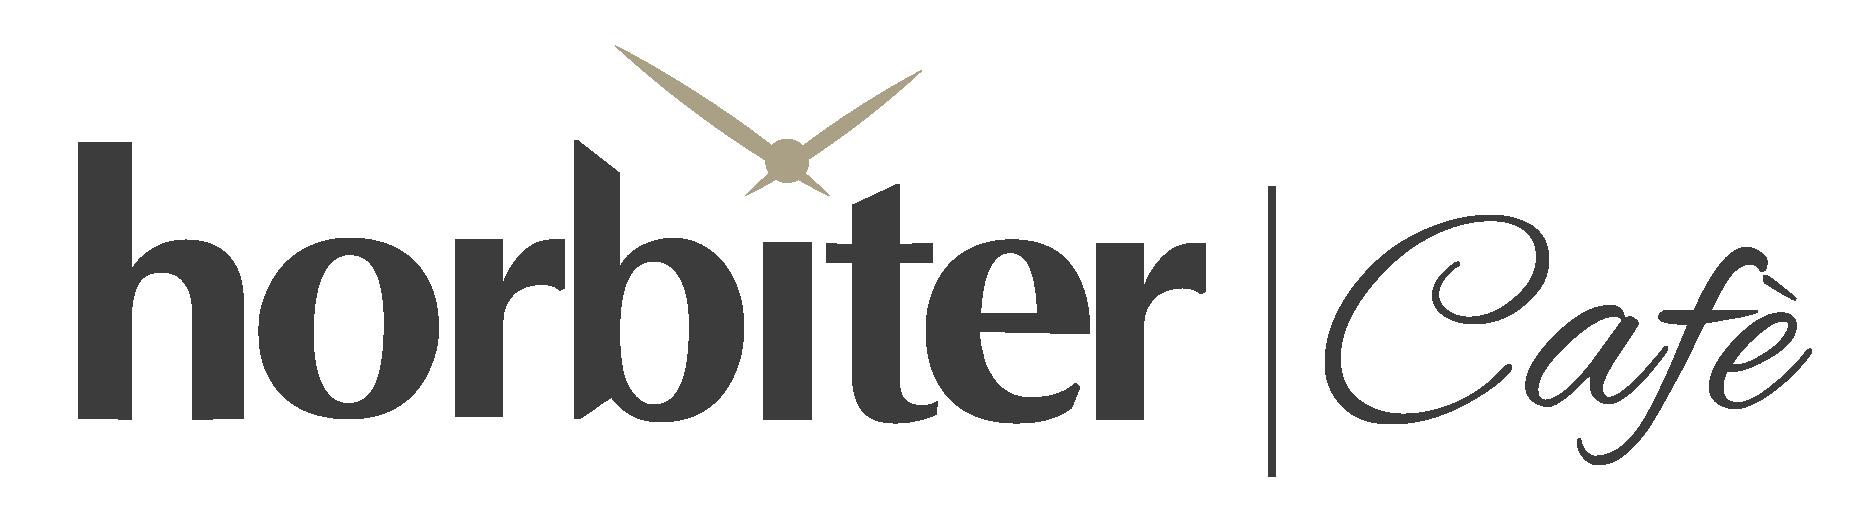 Horbiter Cafè